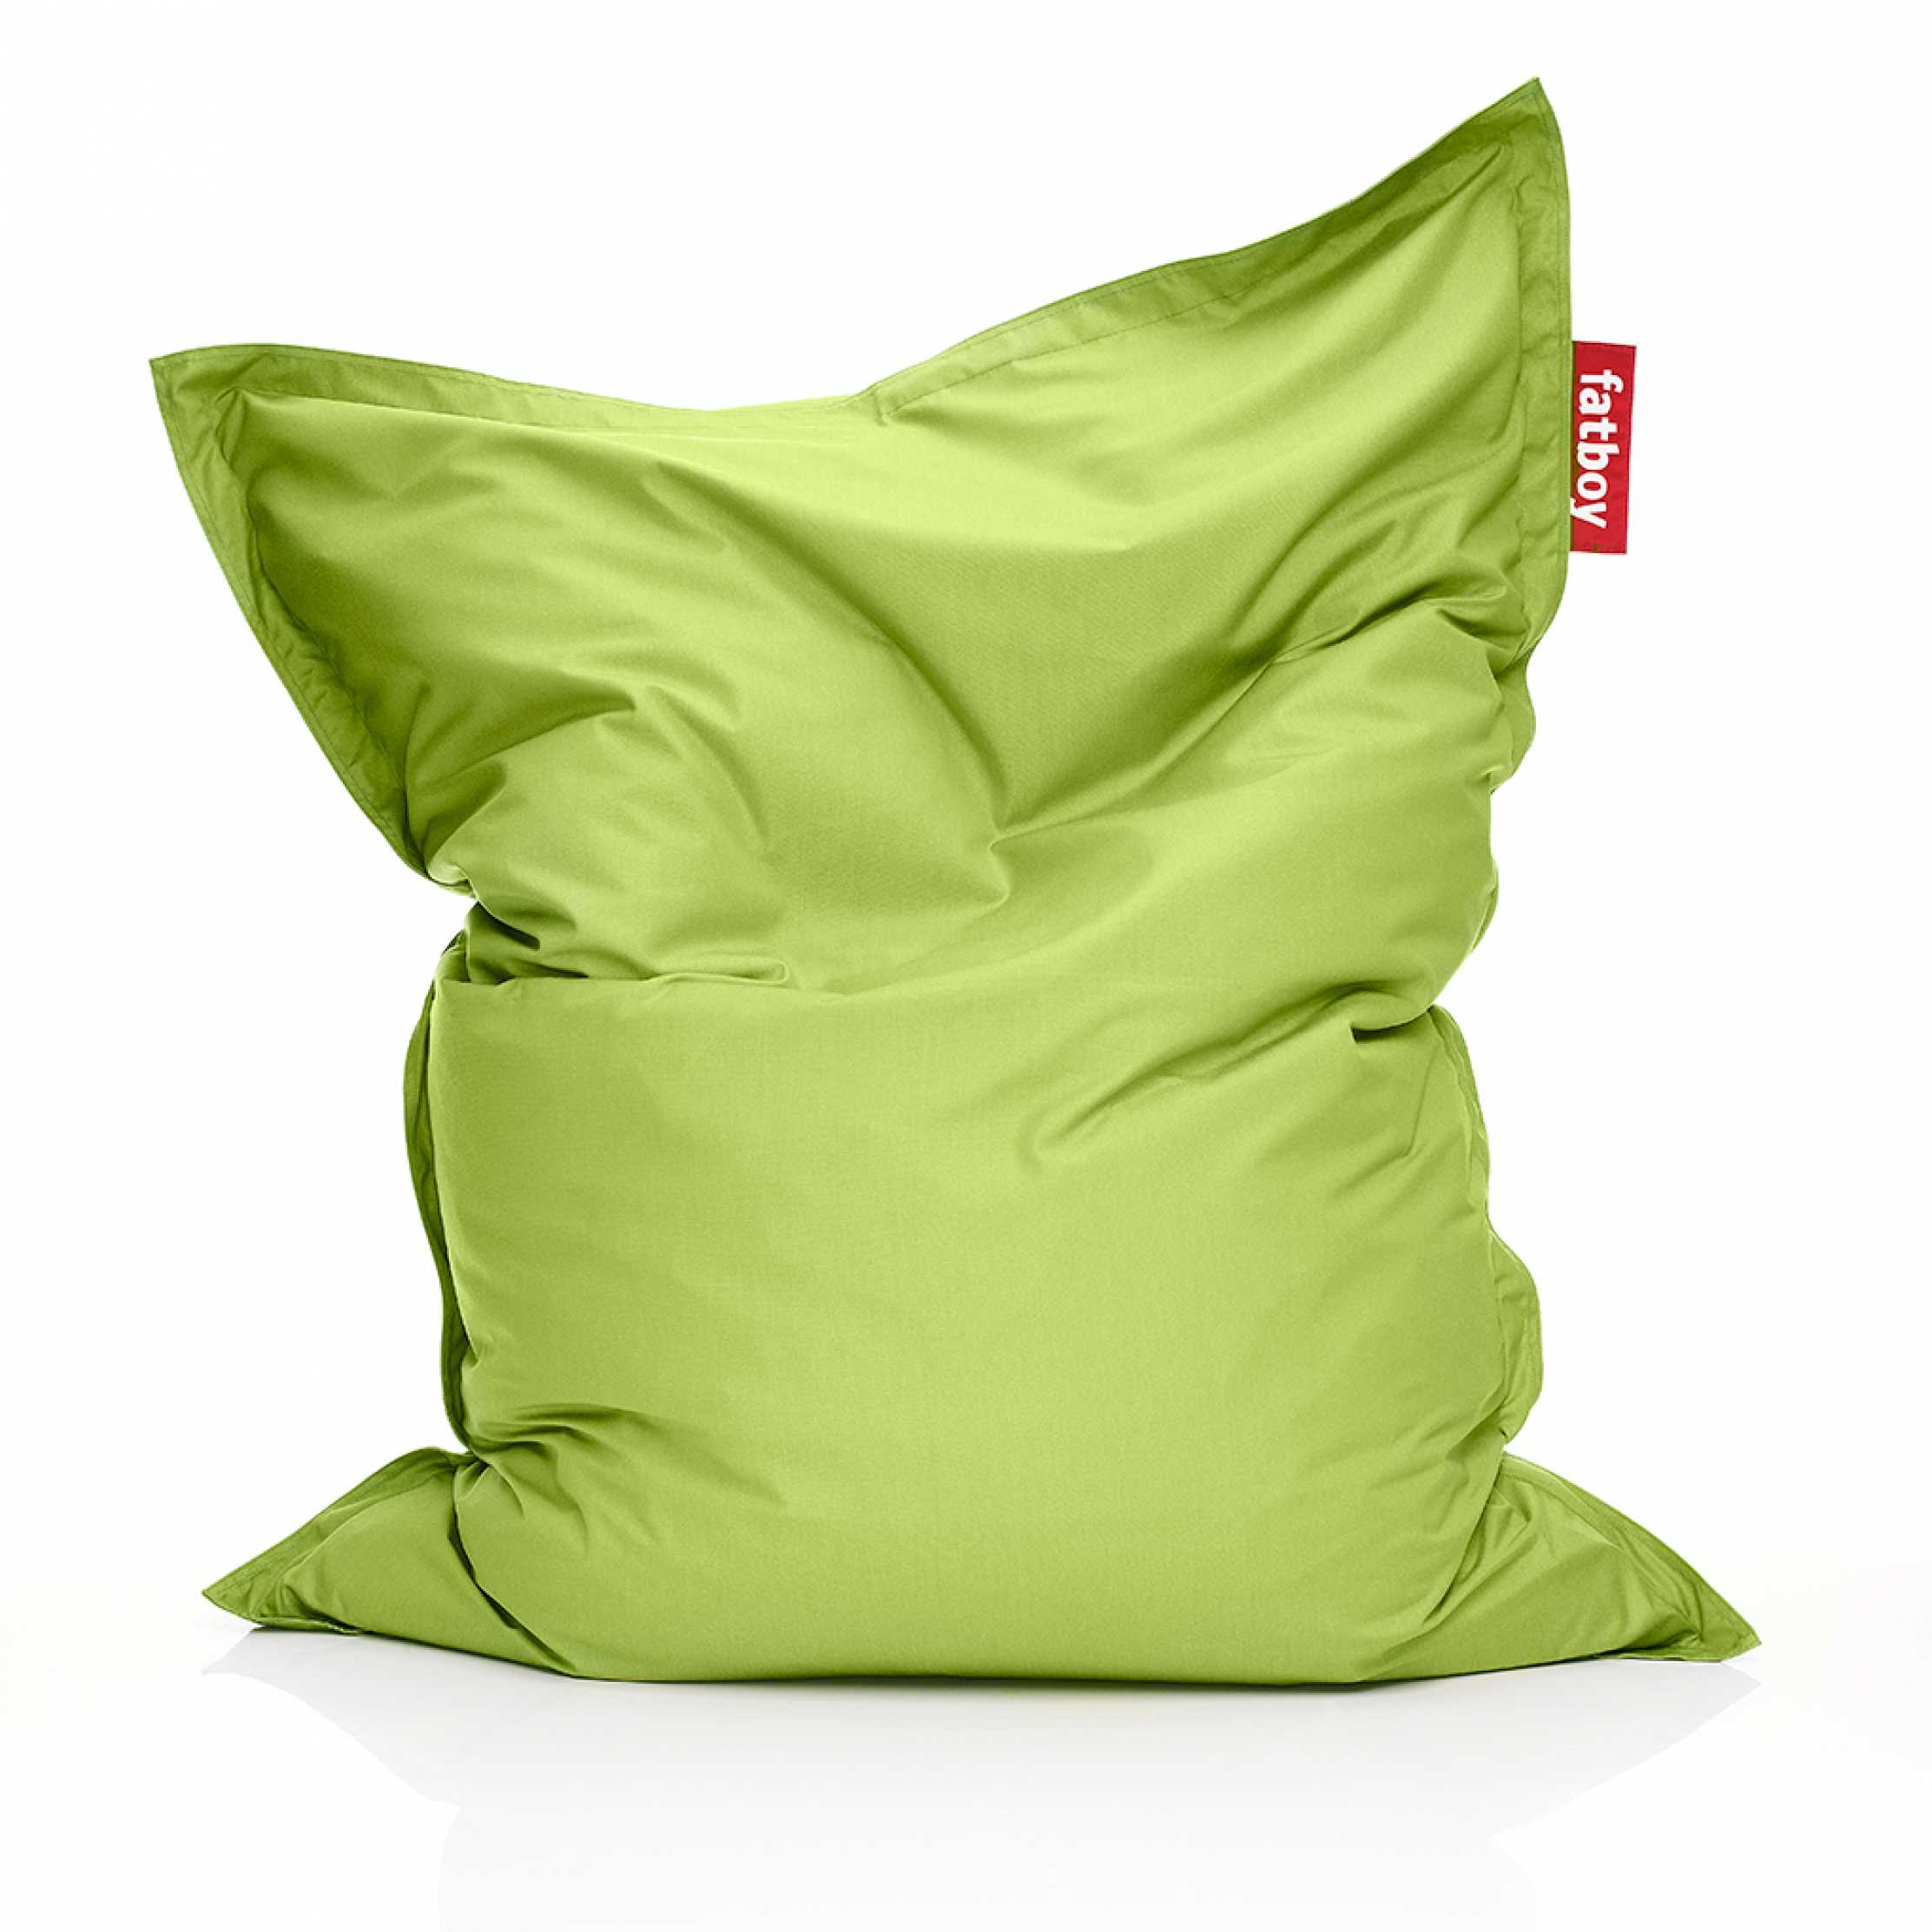 Remarkable Fat Boy Bean Bag Outdoor Home Yacht Linen And Interiors Cjindustries Chair Design For Home Cjindustriesco